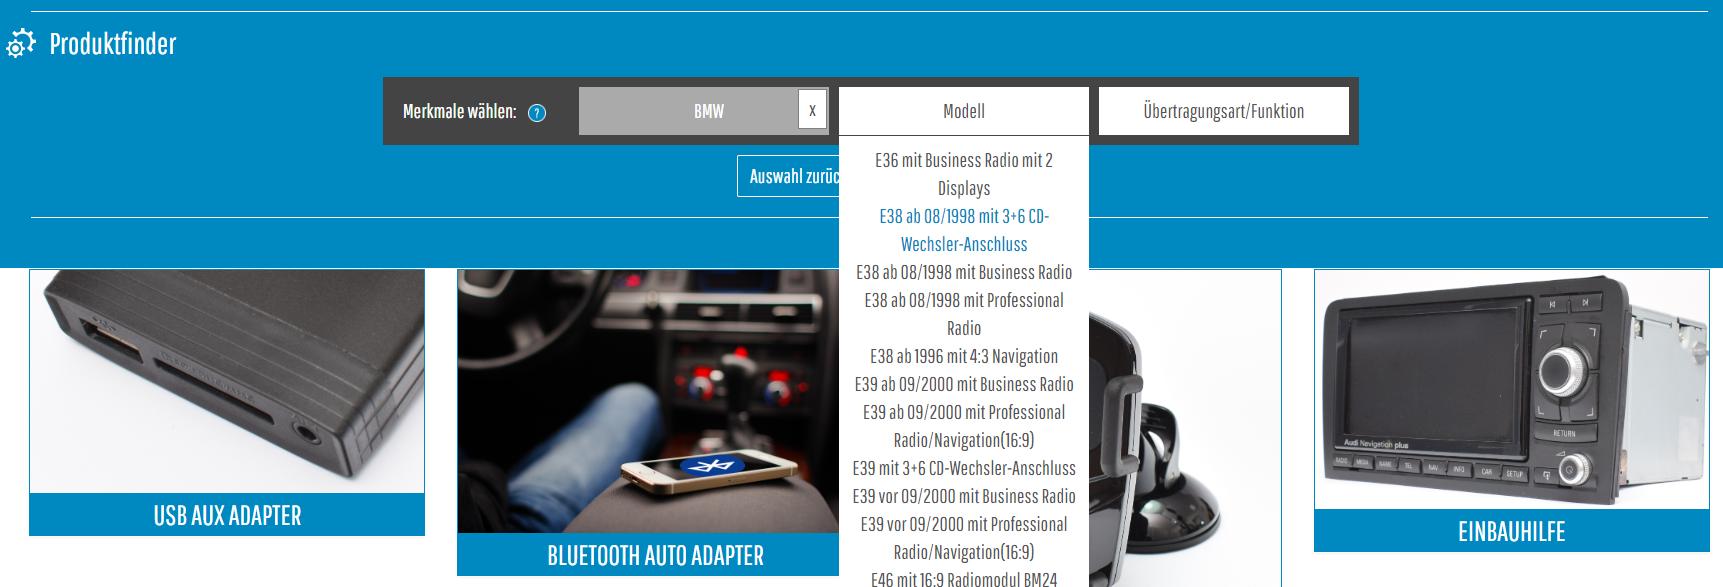 MusikimAuto-JTL-Shop-Produktfinder-Anklicken-Modell